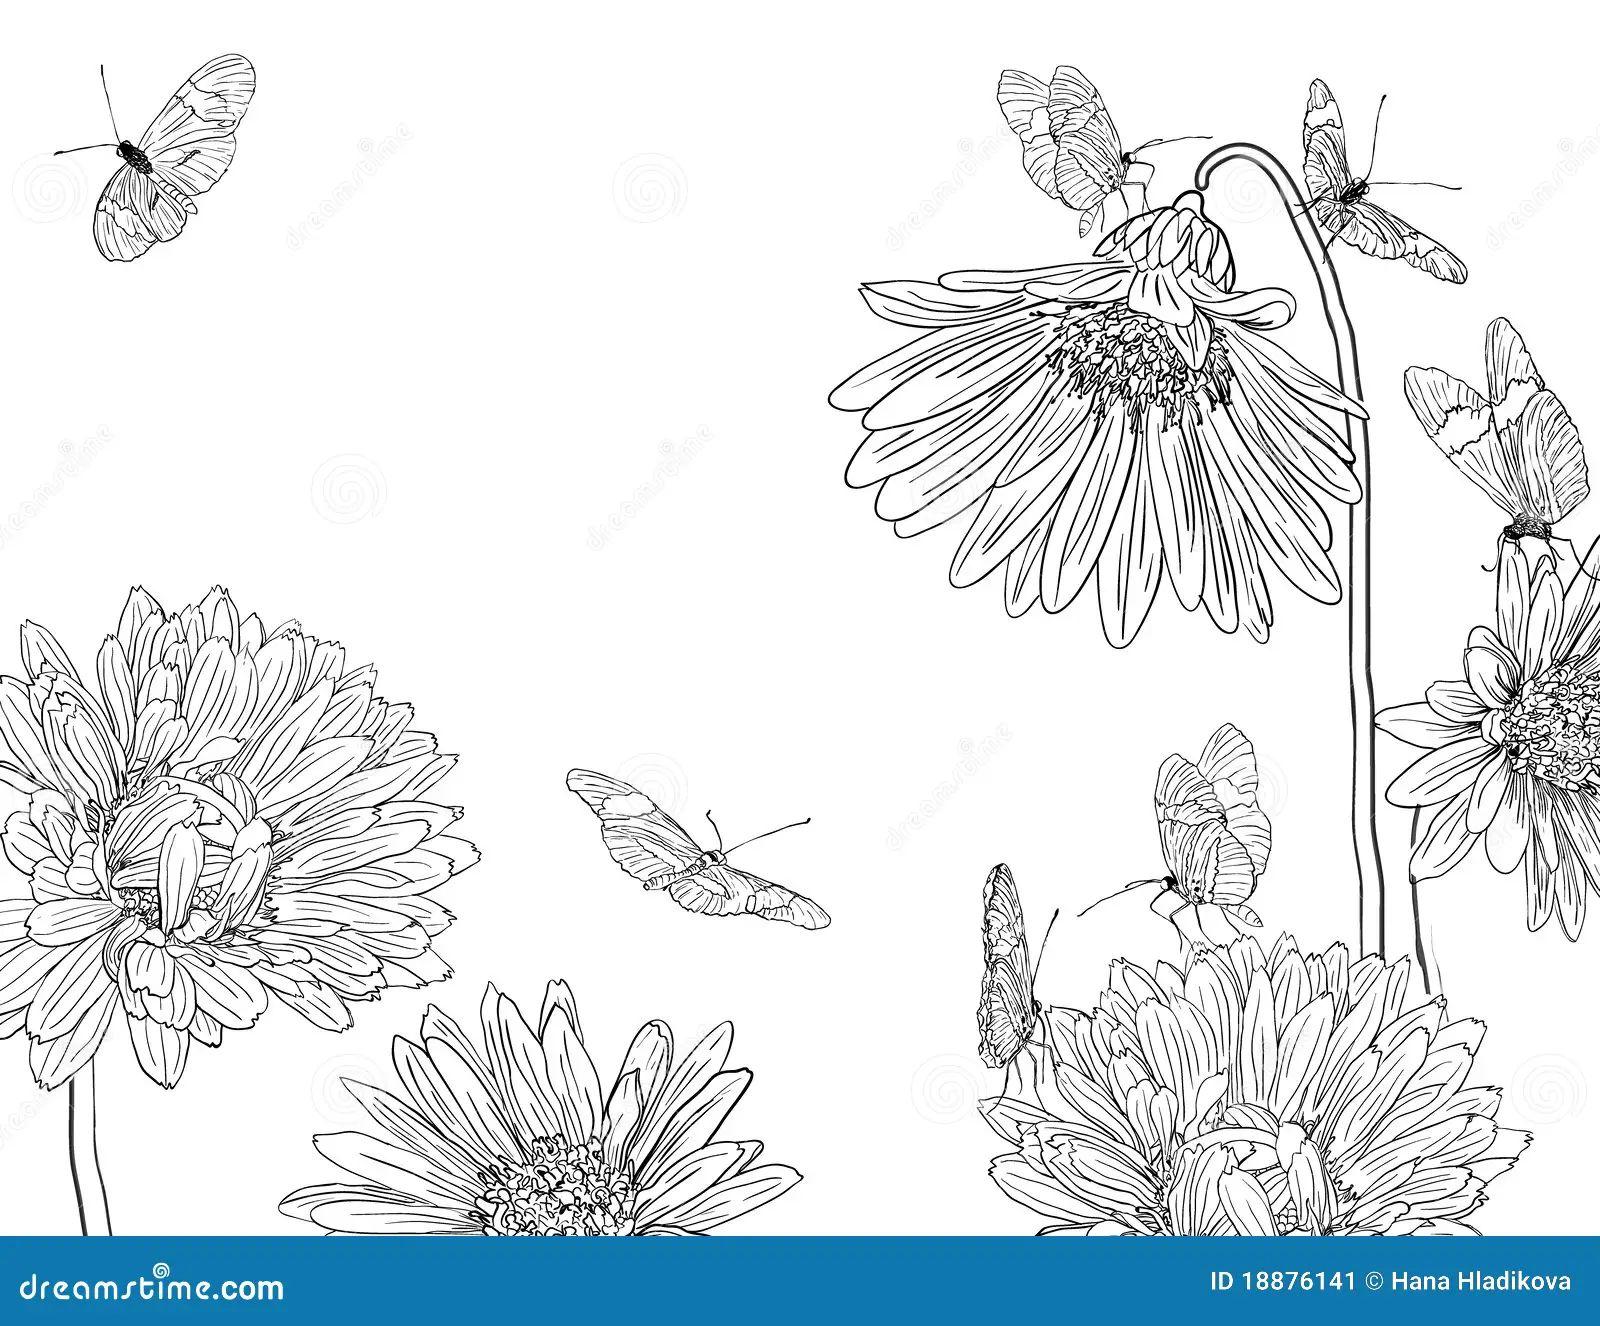 Royalty free stock photo download garden sketch